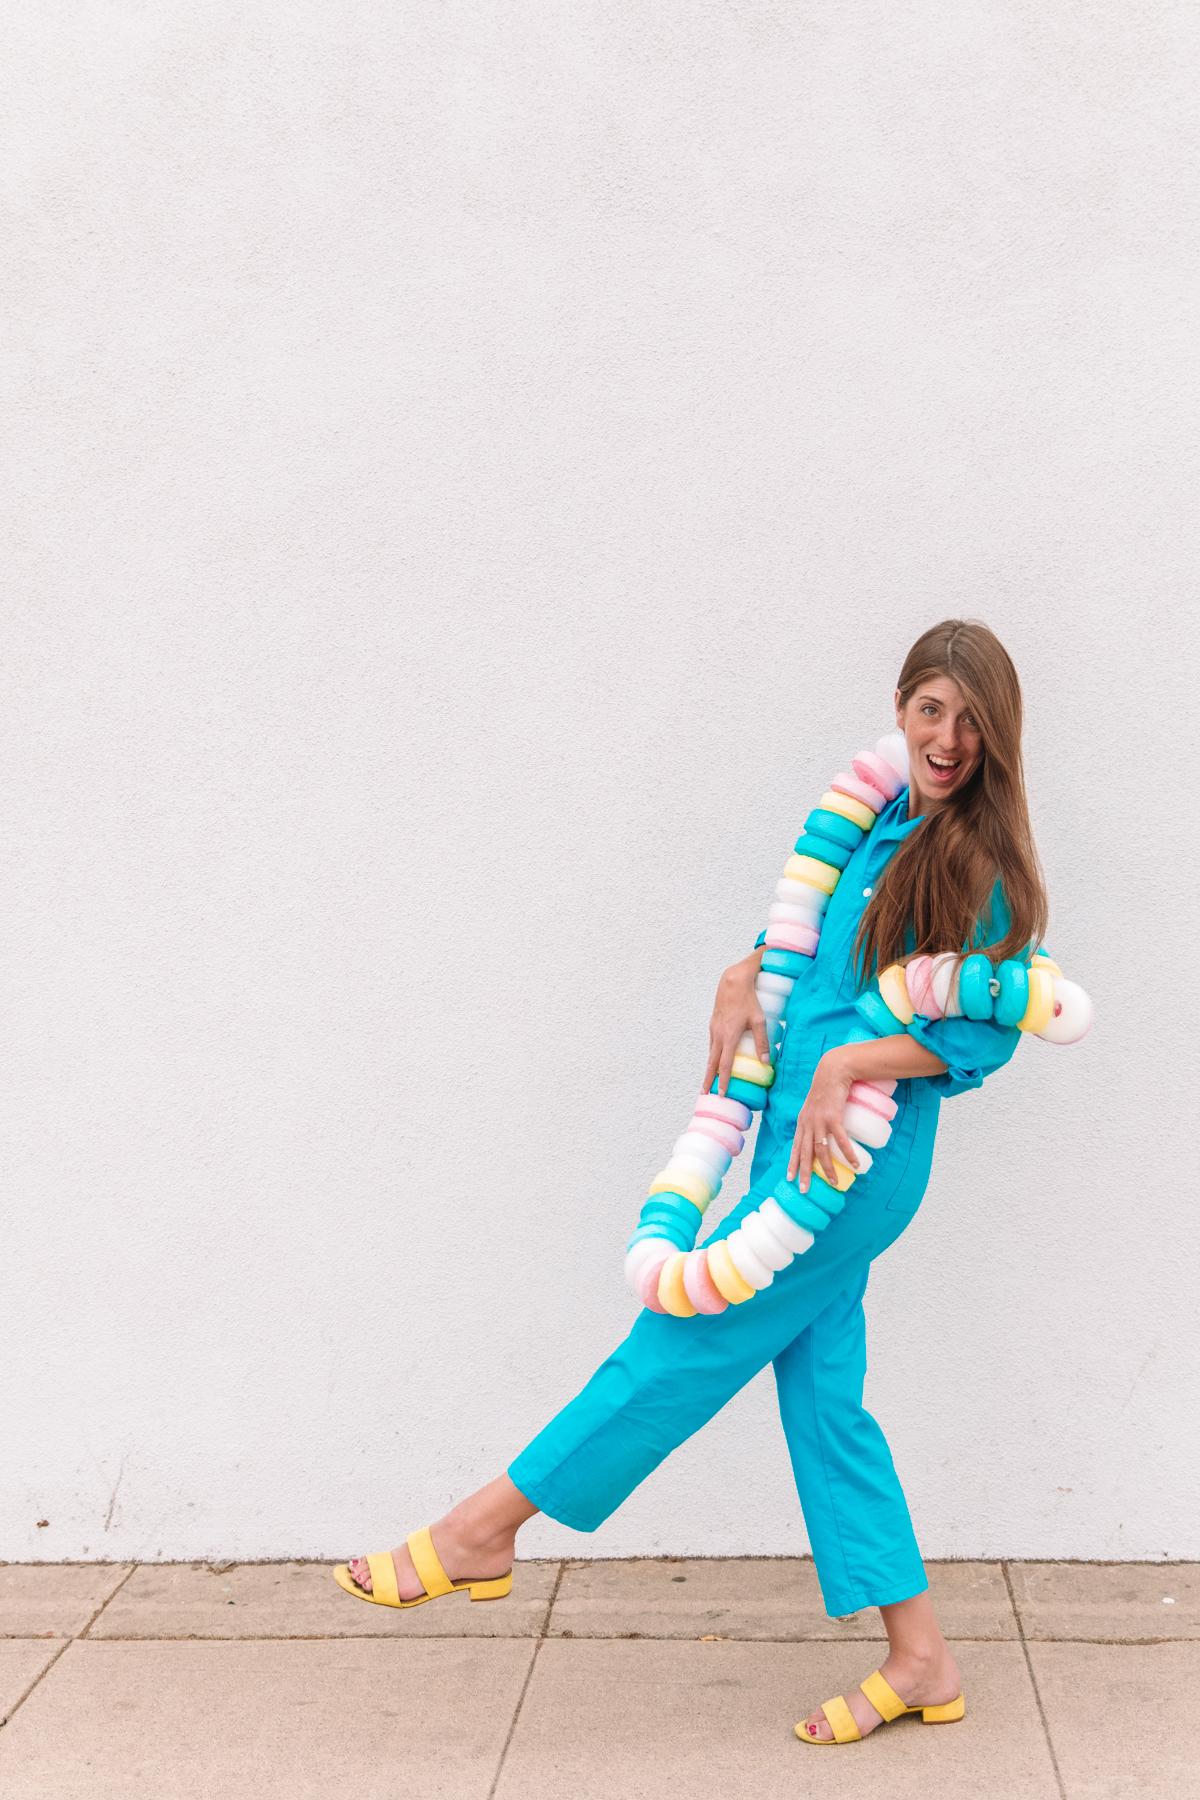 Candy Halloween Costume Ideas.Diy Food Halloween Costumes 30 Ideas For Any Age Studio Diy